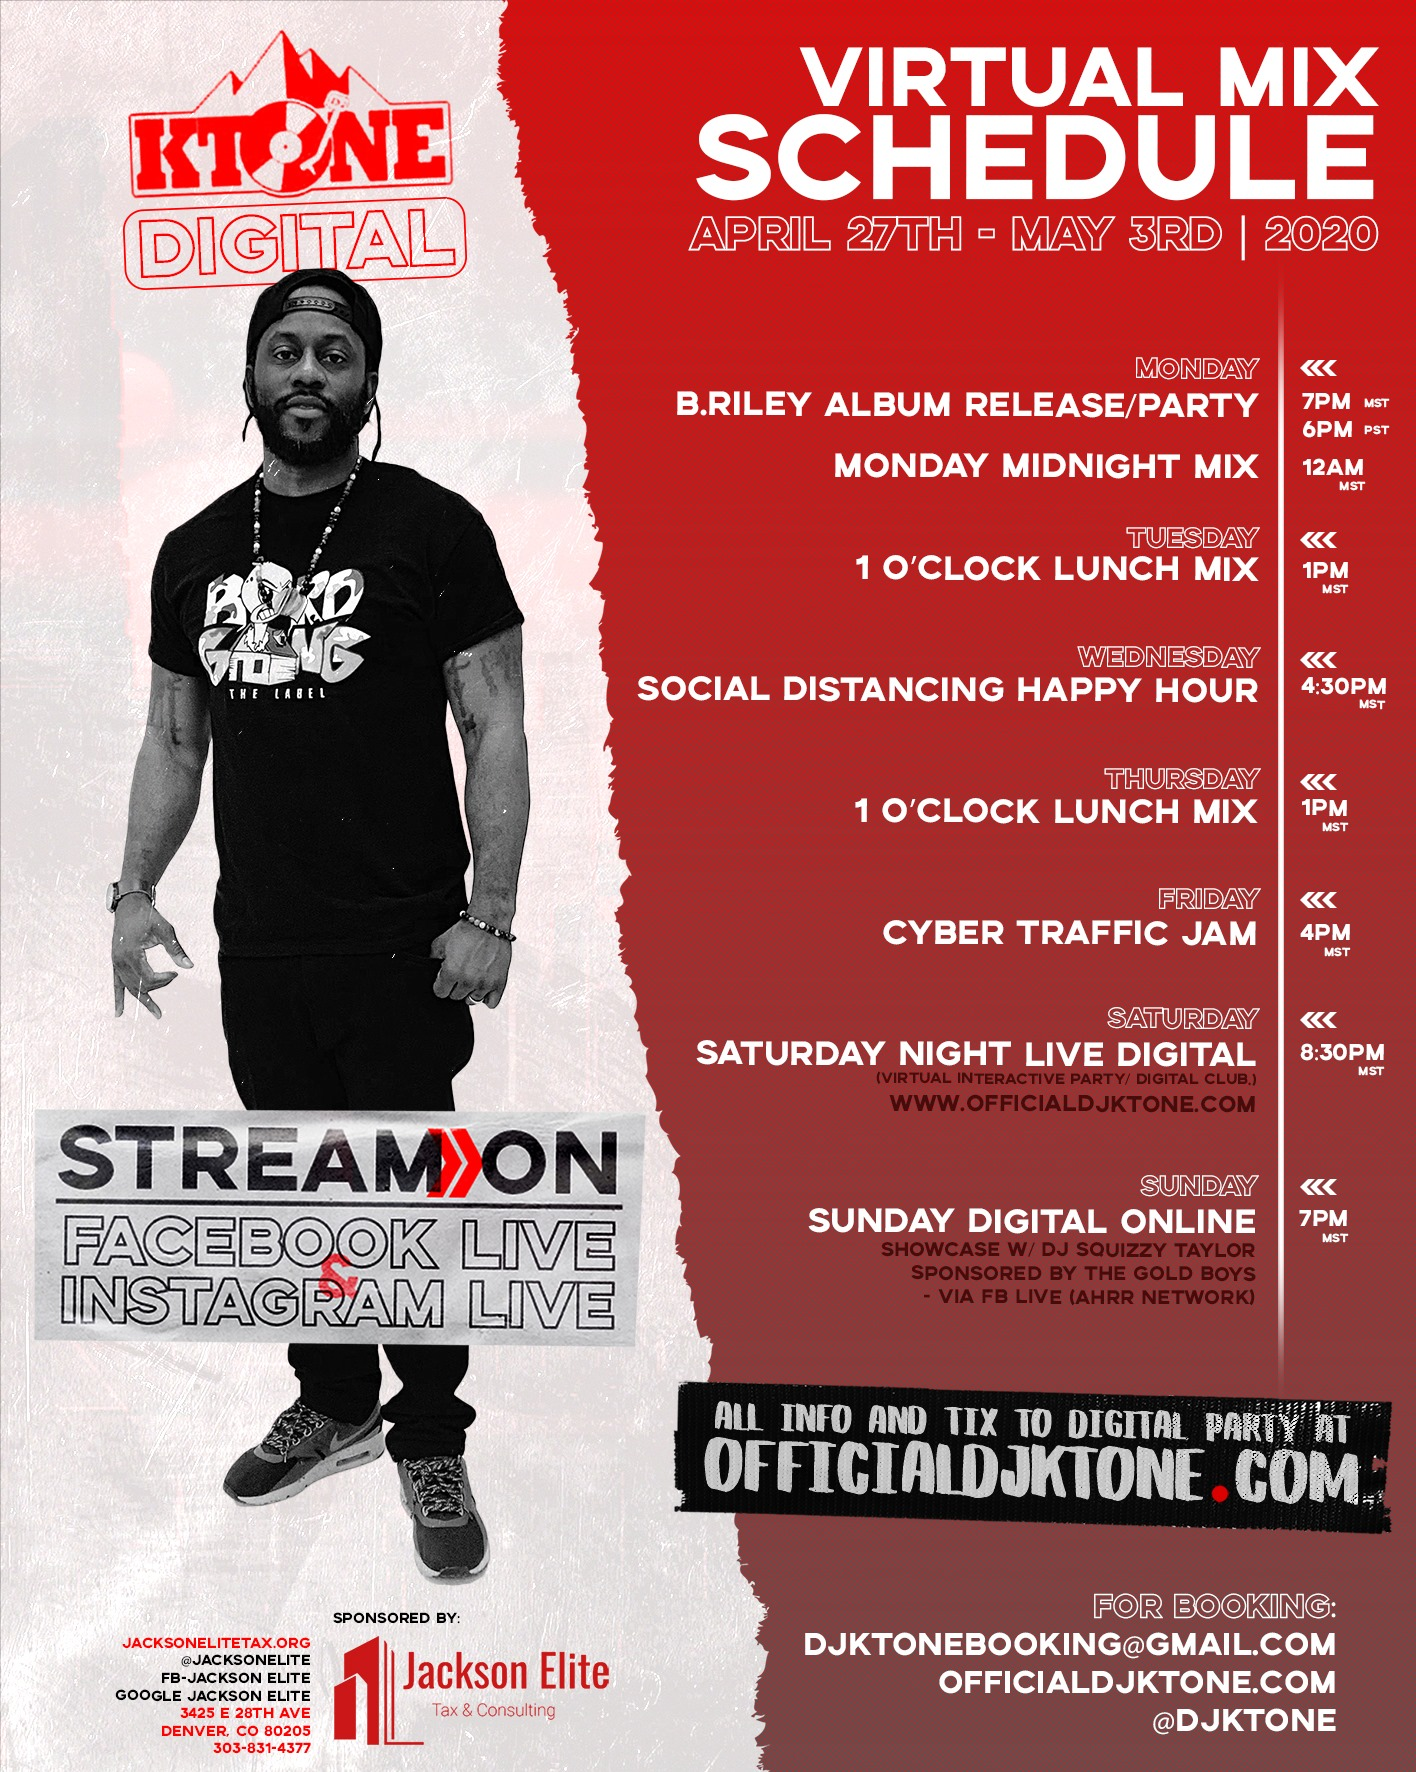 DJ Ktone Virtual Party 2020